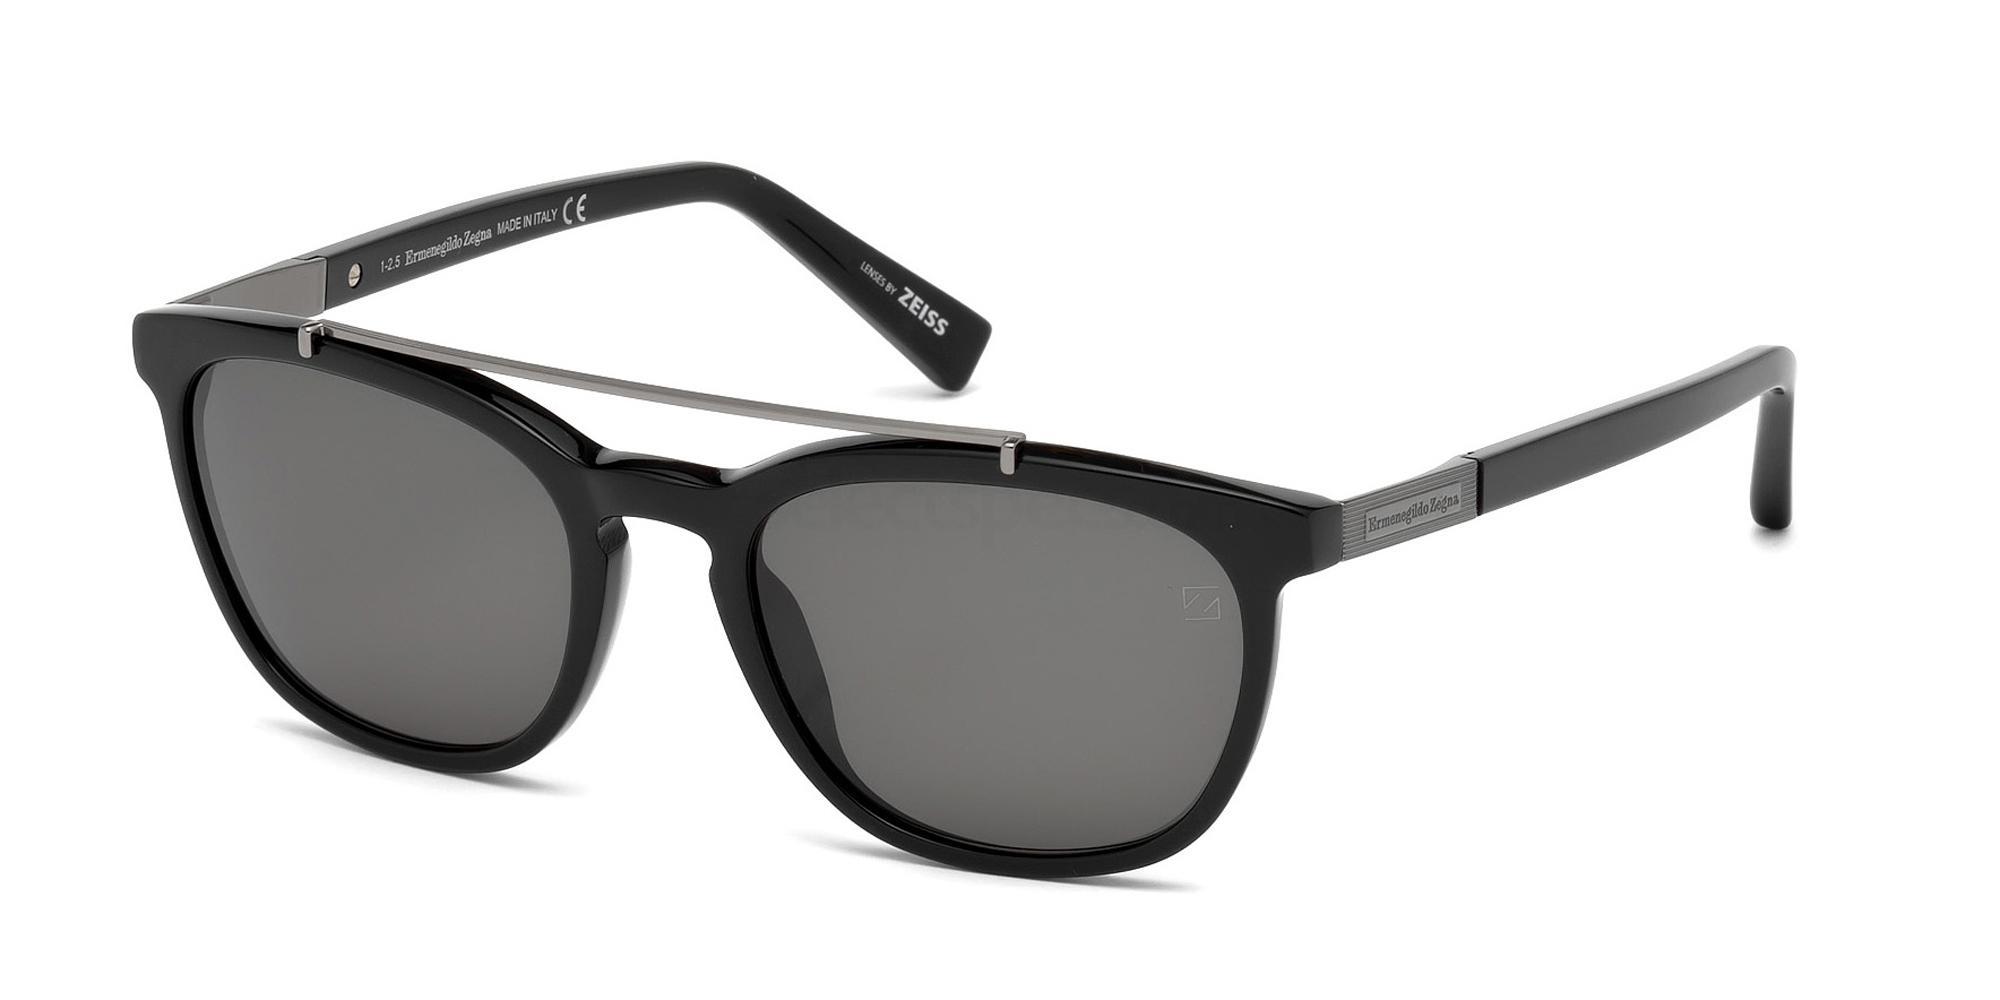 01D EZ0044 Sunglasses, Ermenegildo Zegna